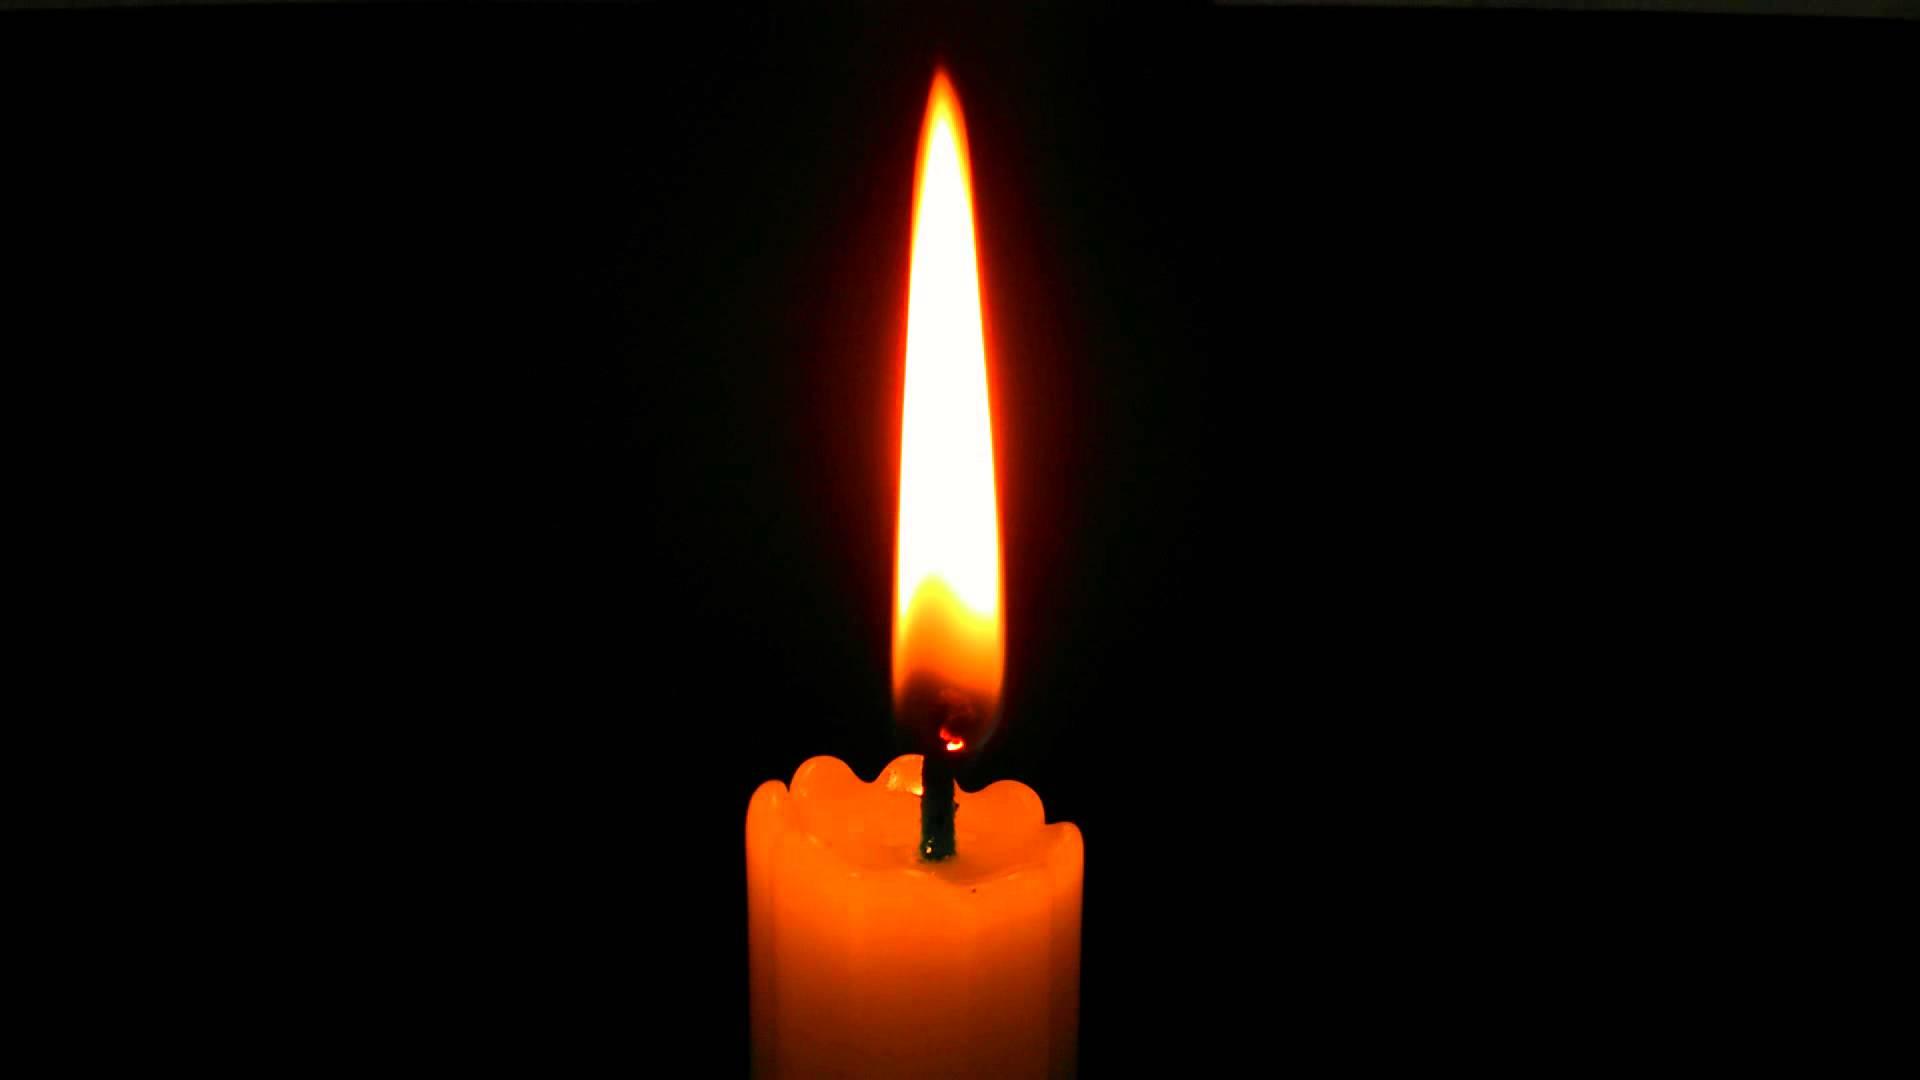 meditation candle flame no sound 1hour - YouTube